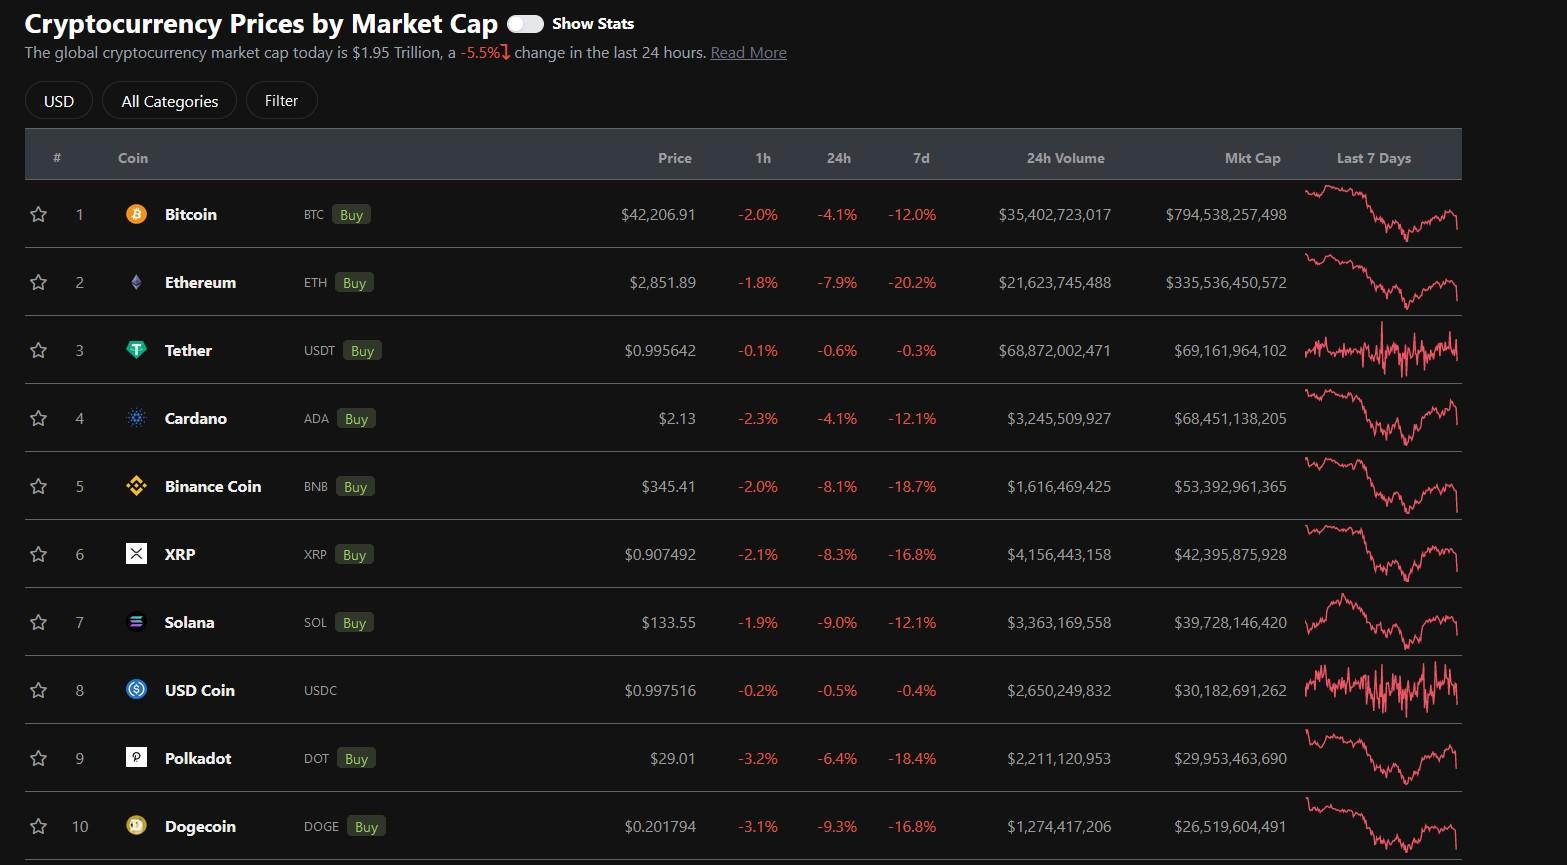 Post Recent China FUD Market Situation - CoinGecko